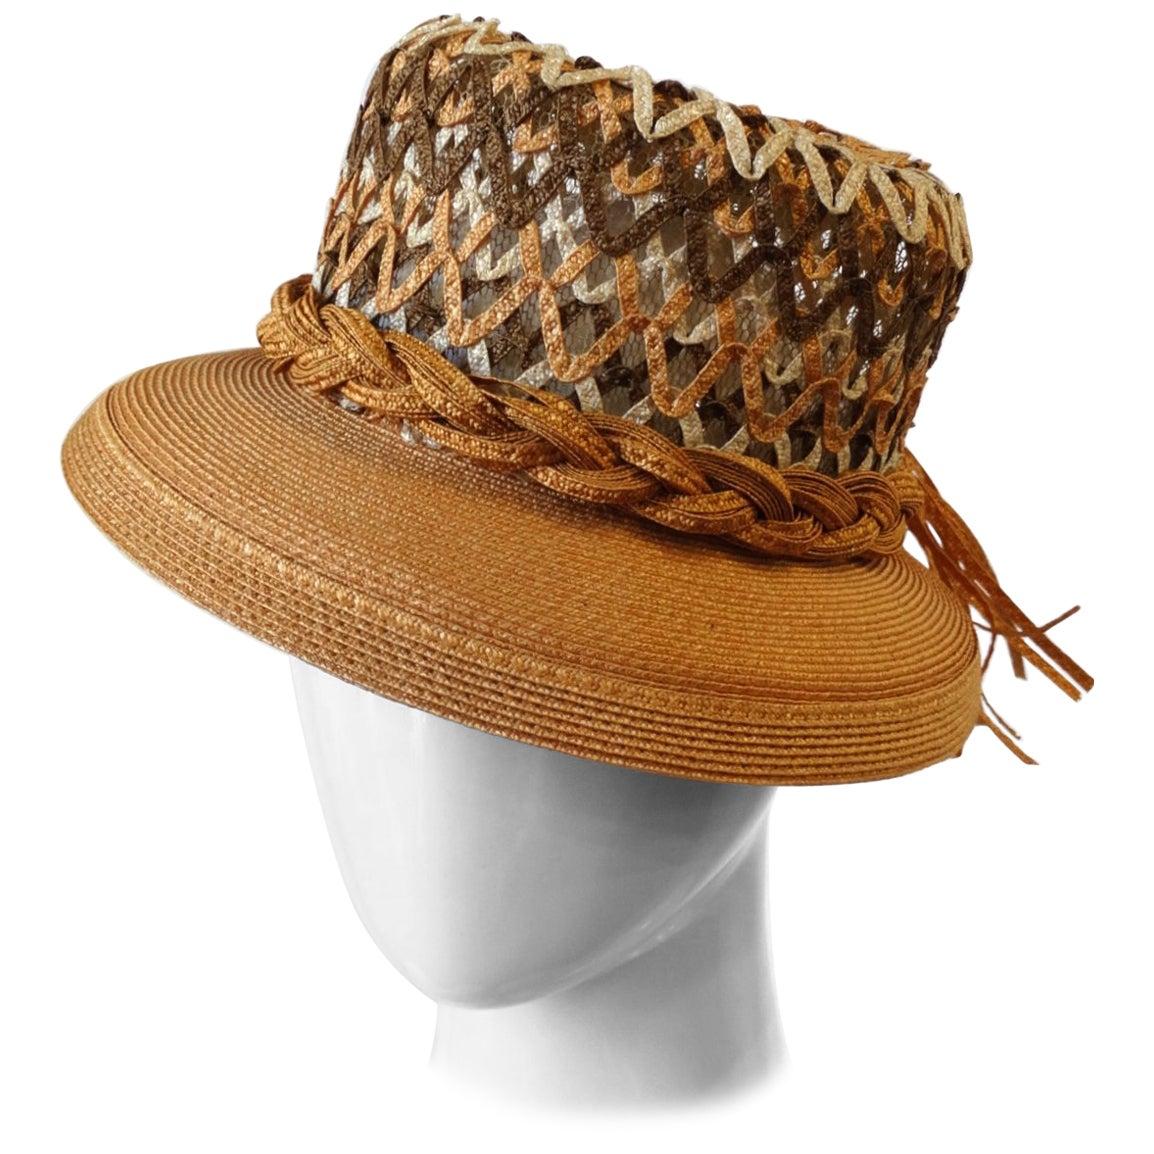 Yves Saint Laurent Woven Straw Boater Hat, 1960s